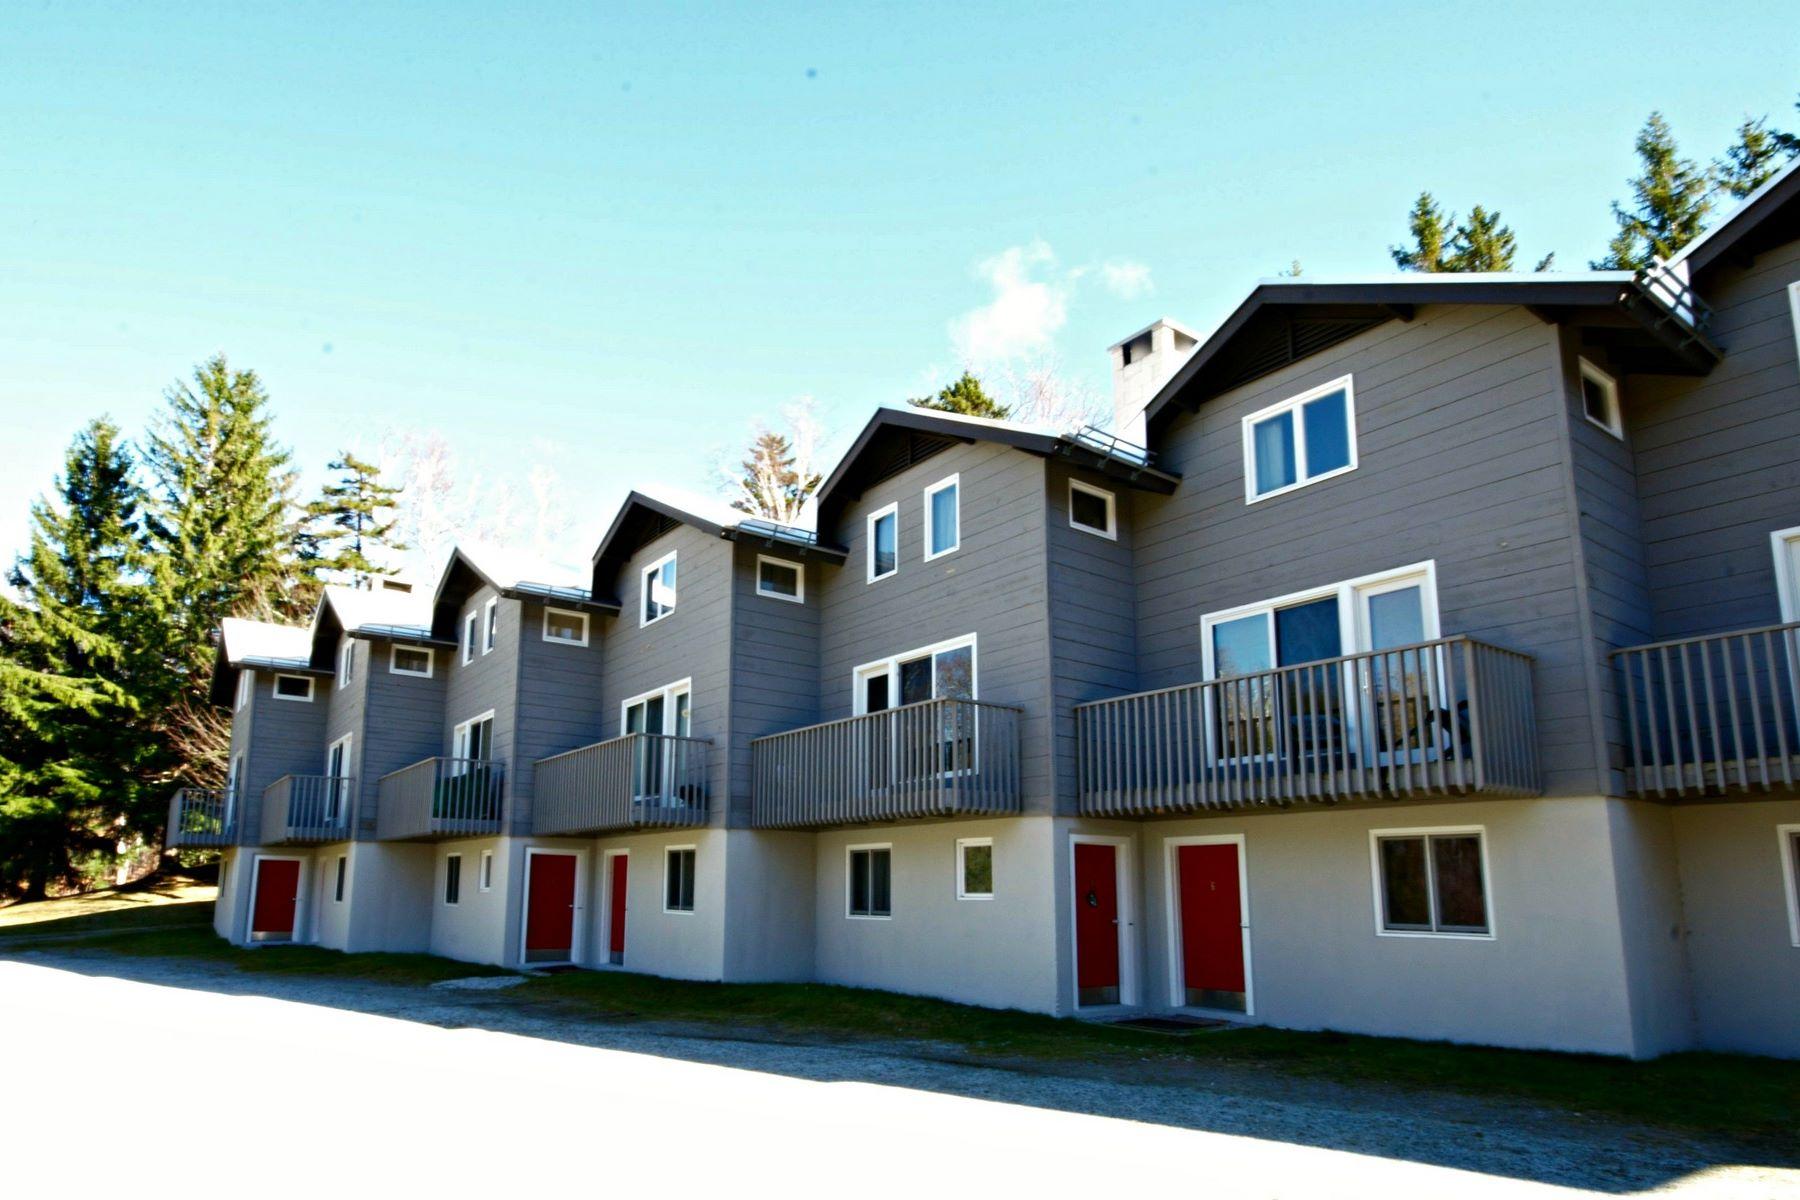 Condominium for Sale at 5 Red Maple Birch Hill Road, Winhall 5 Red Maple Birch Hill Rd, Winhall, Vermont, 05340 United States